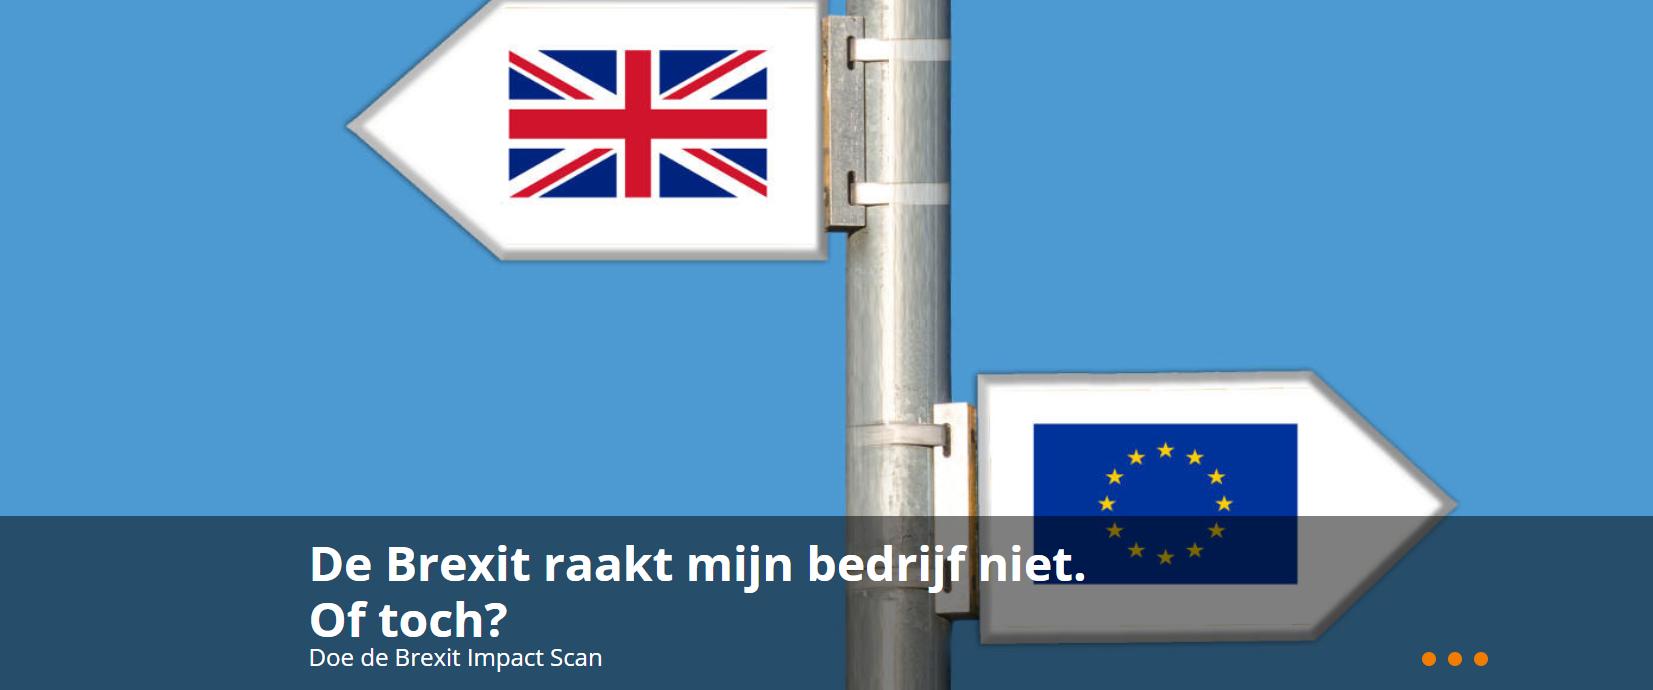 Doe hier de Brexit Impact Scan